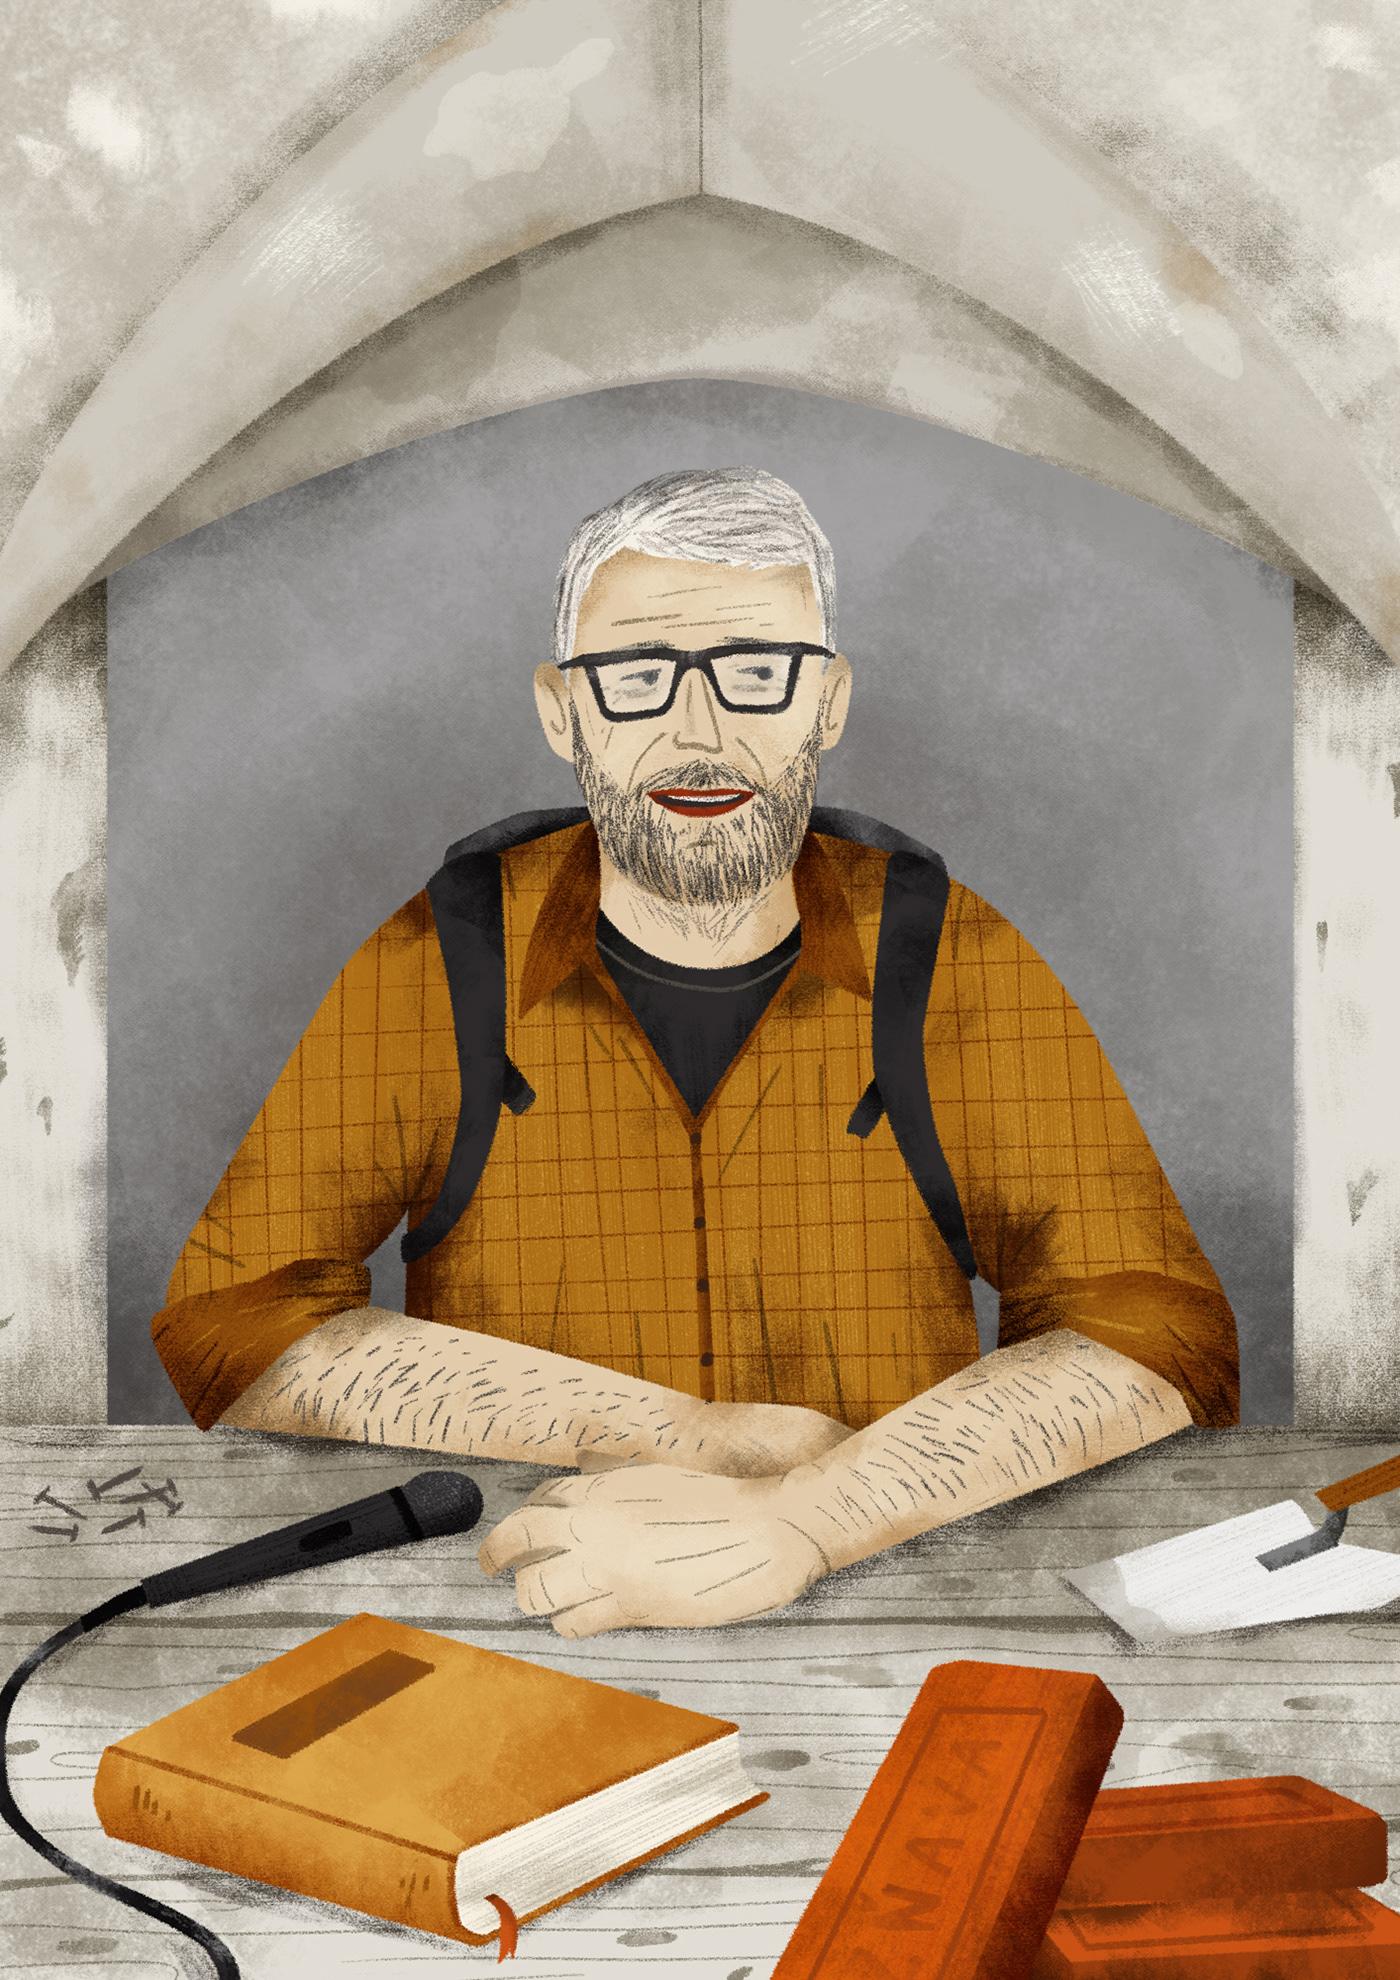 biography book illustration children book Editorial Illustration illustrator for hire Magazine illustration portrait illustration poster illustration slovak illustrator